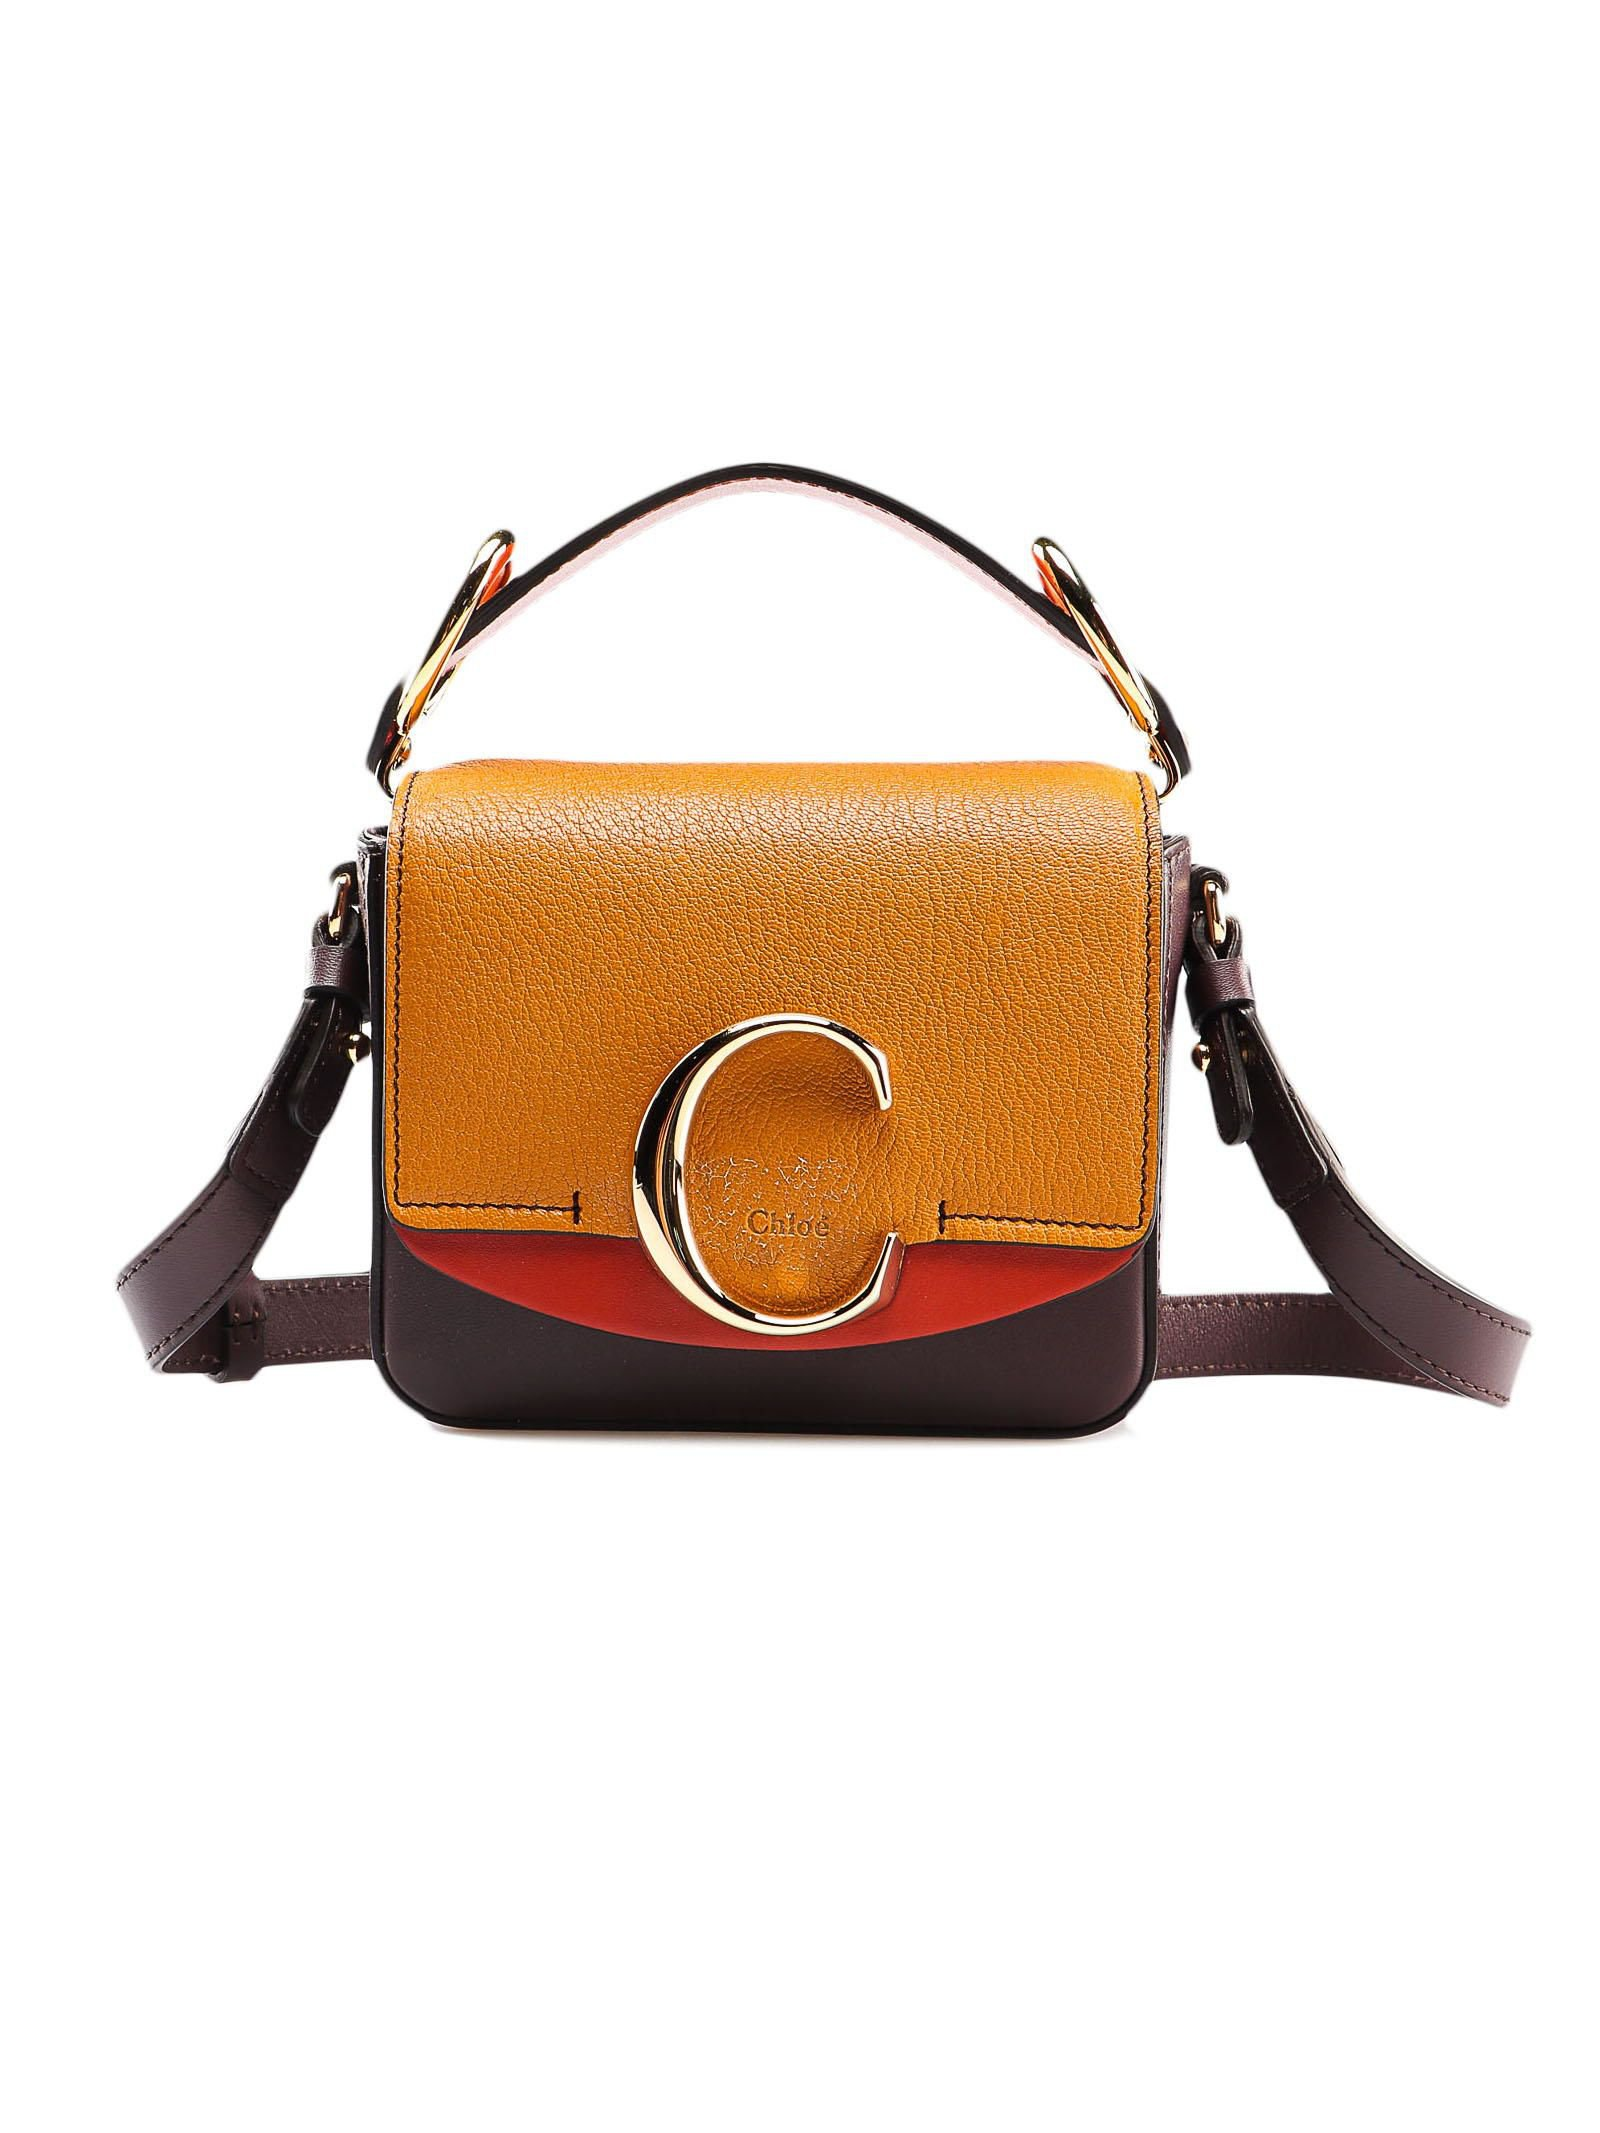 Chloé C Bag Mini